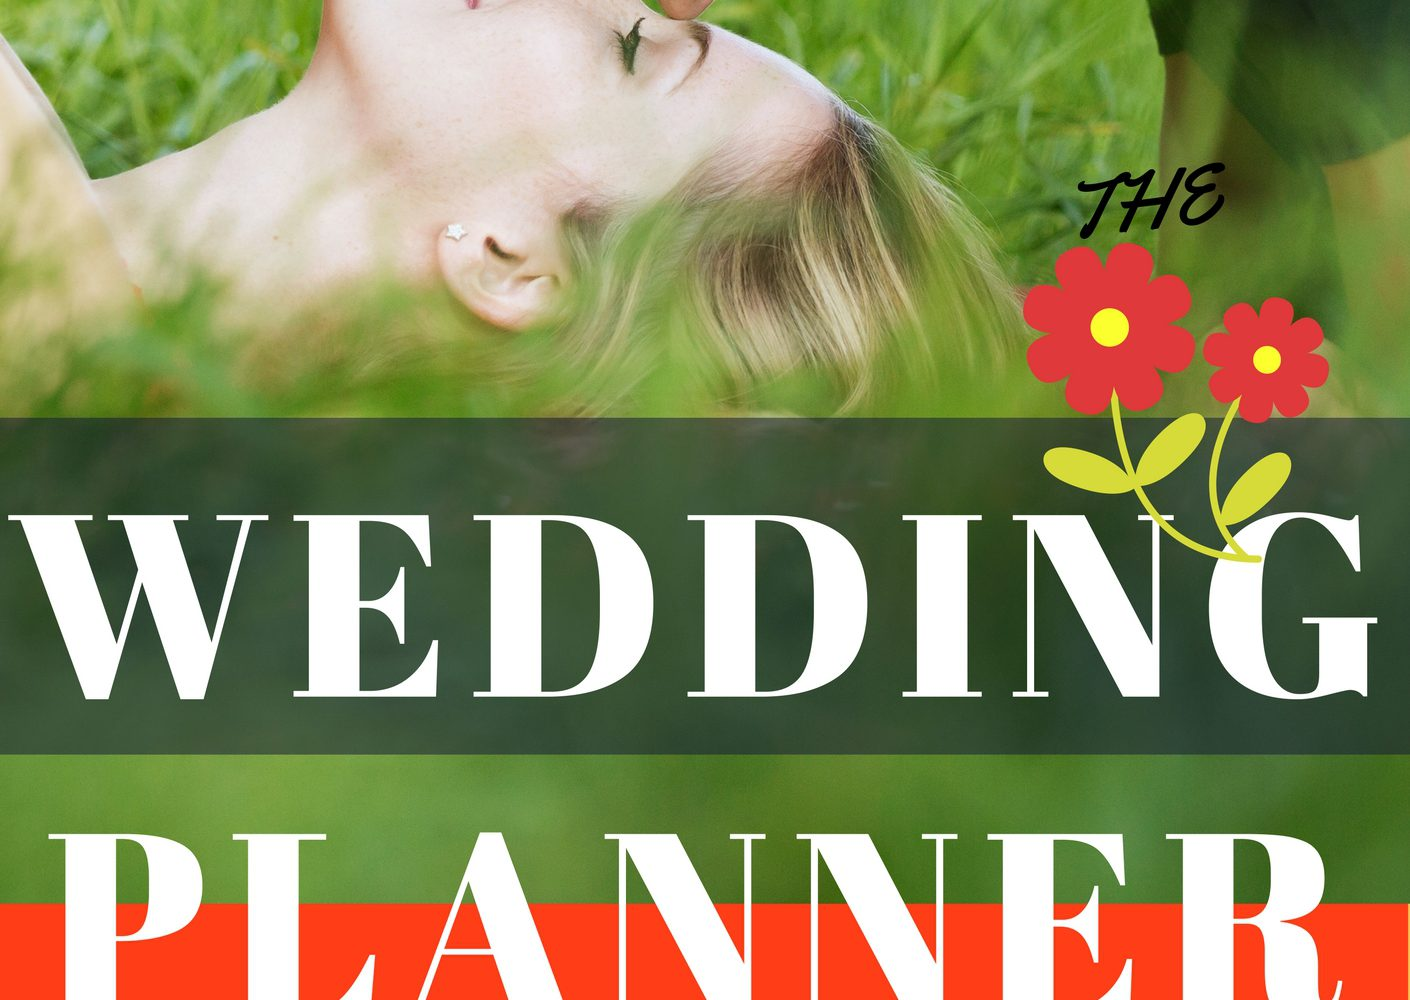 Wedding Planner - novel - mariyan